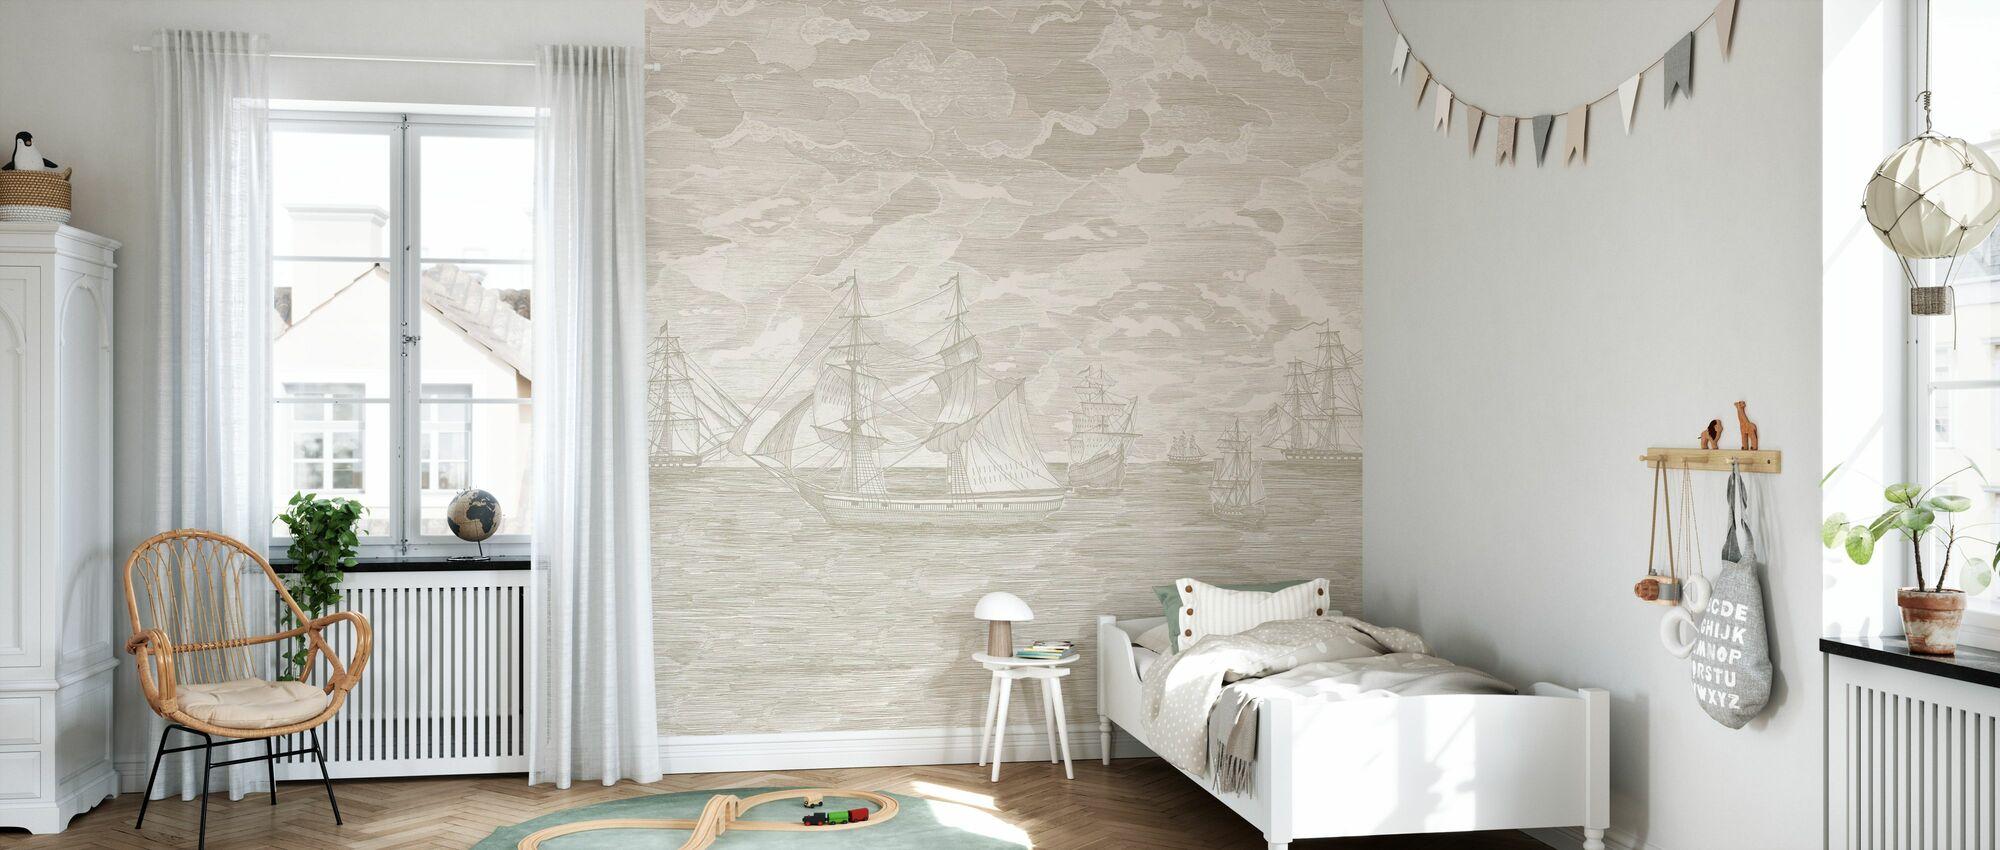 Sail Away - Cream - Wallpaper - Kids Room